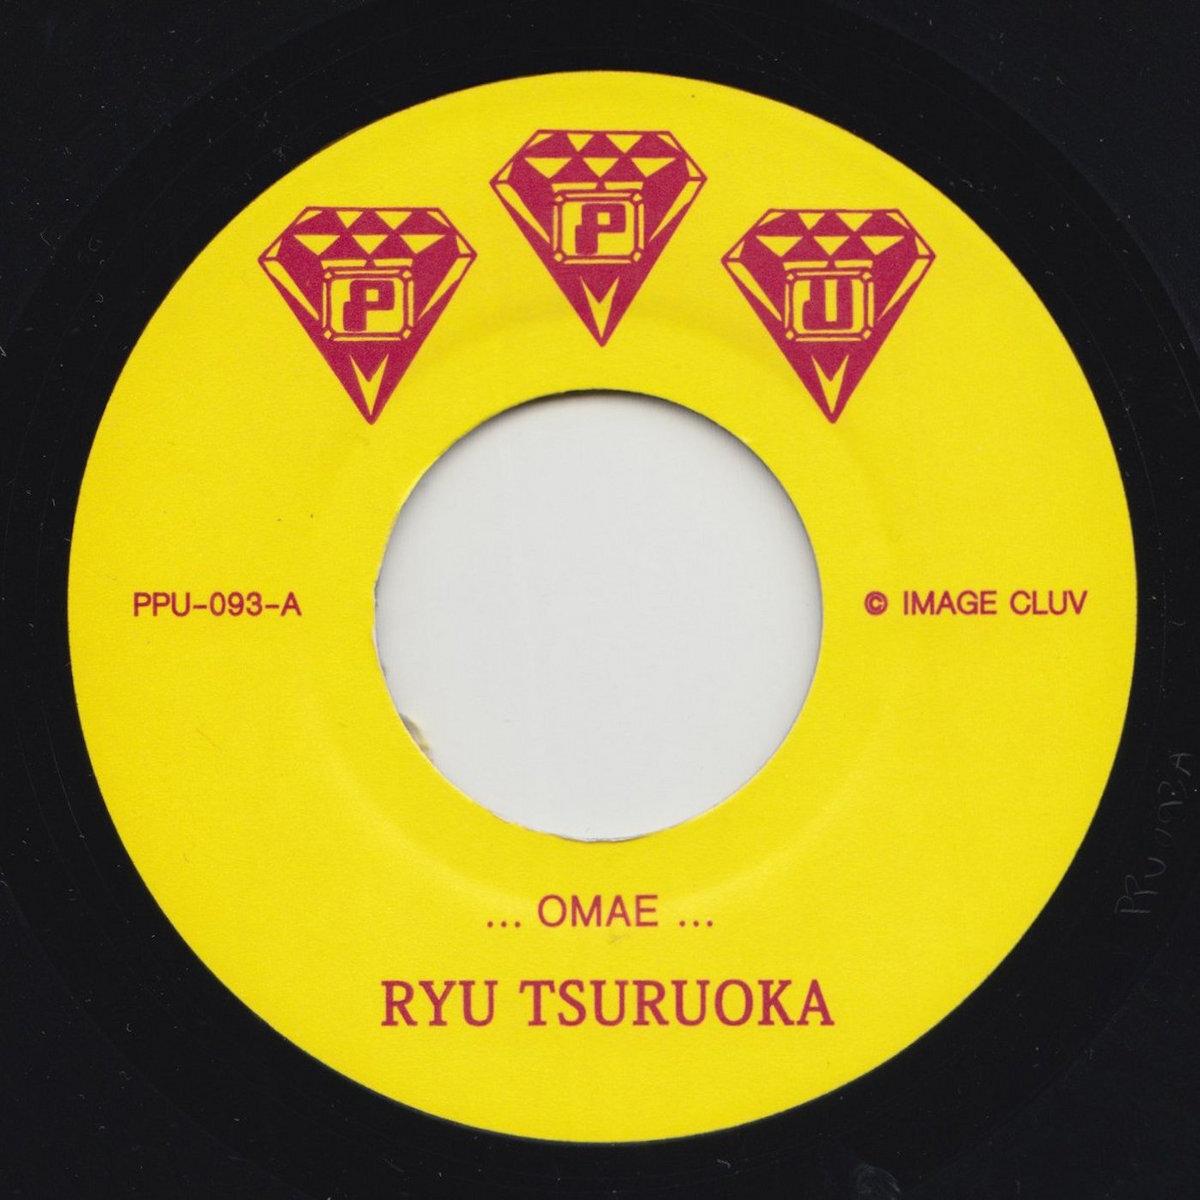 【Vinyl】RYU TSURUOKA - OMAE / WAGAMAMA